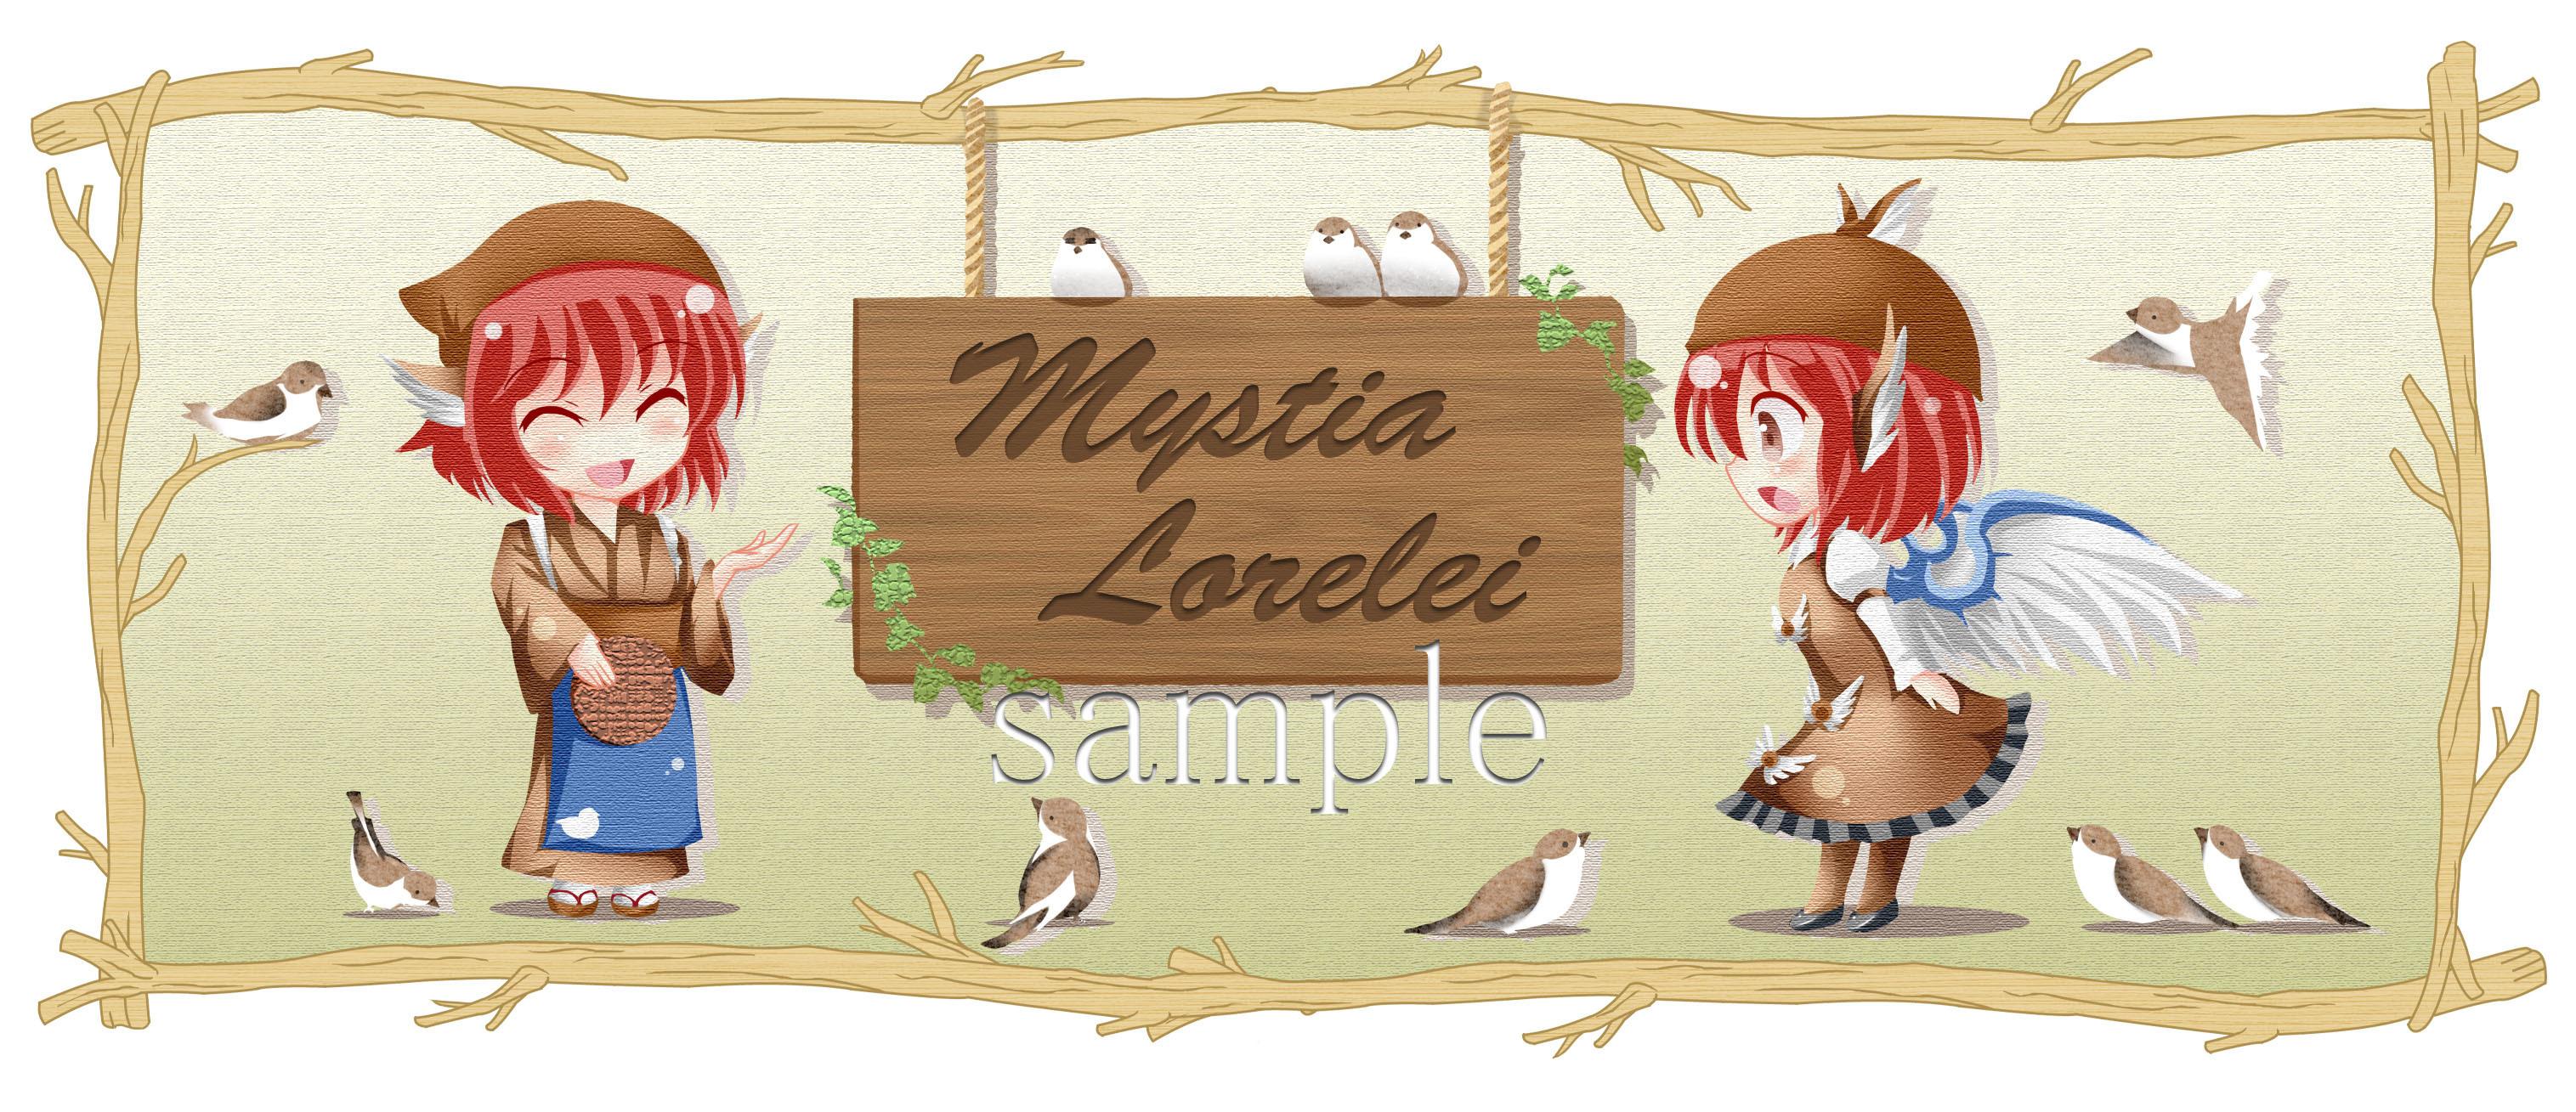 sample_201705252321220a7.jpg